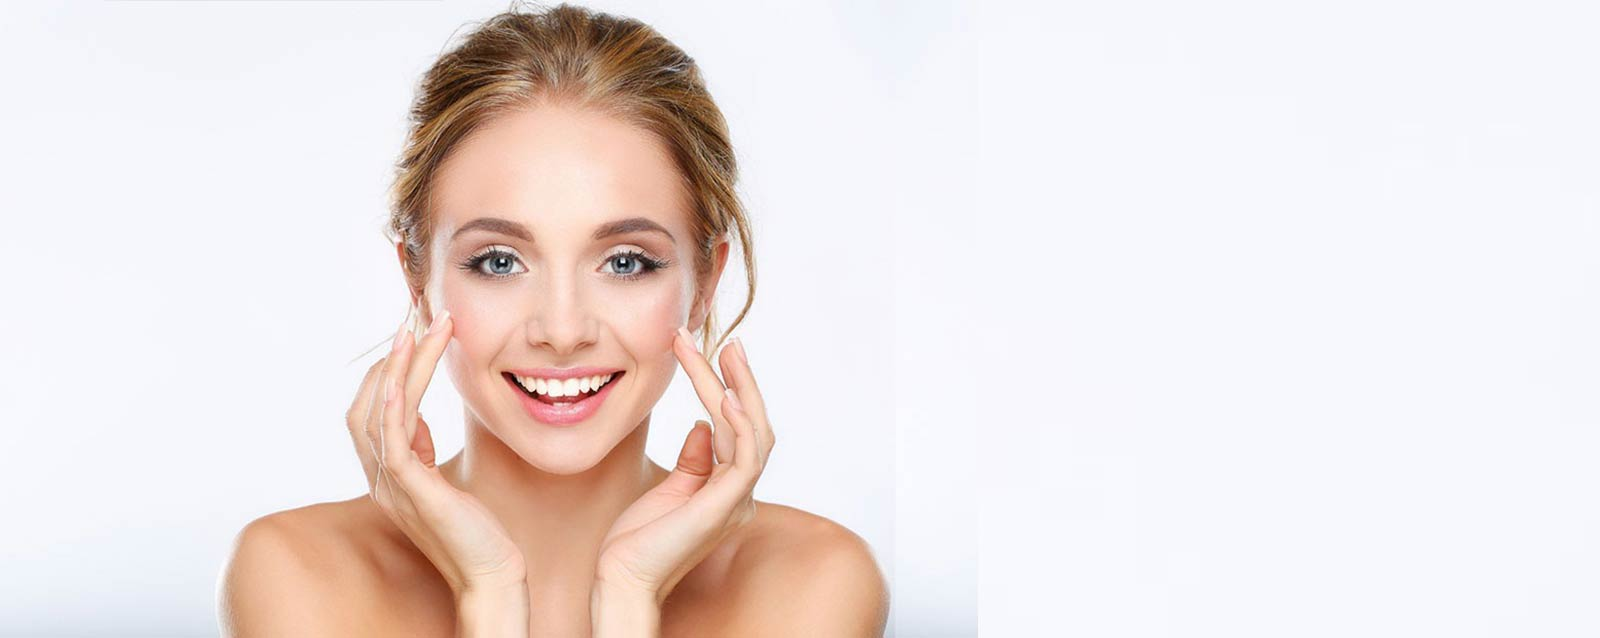 Protocolo: Control Bio Máscara De Argila Pós-Operatório Facial